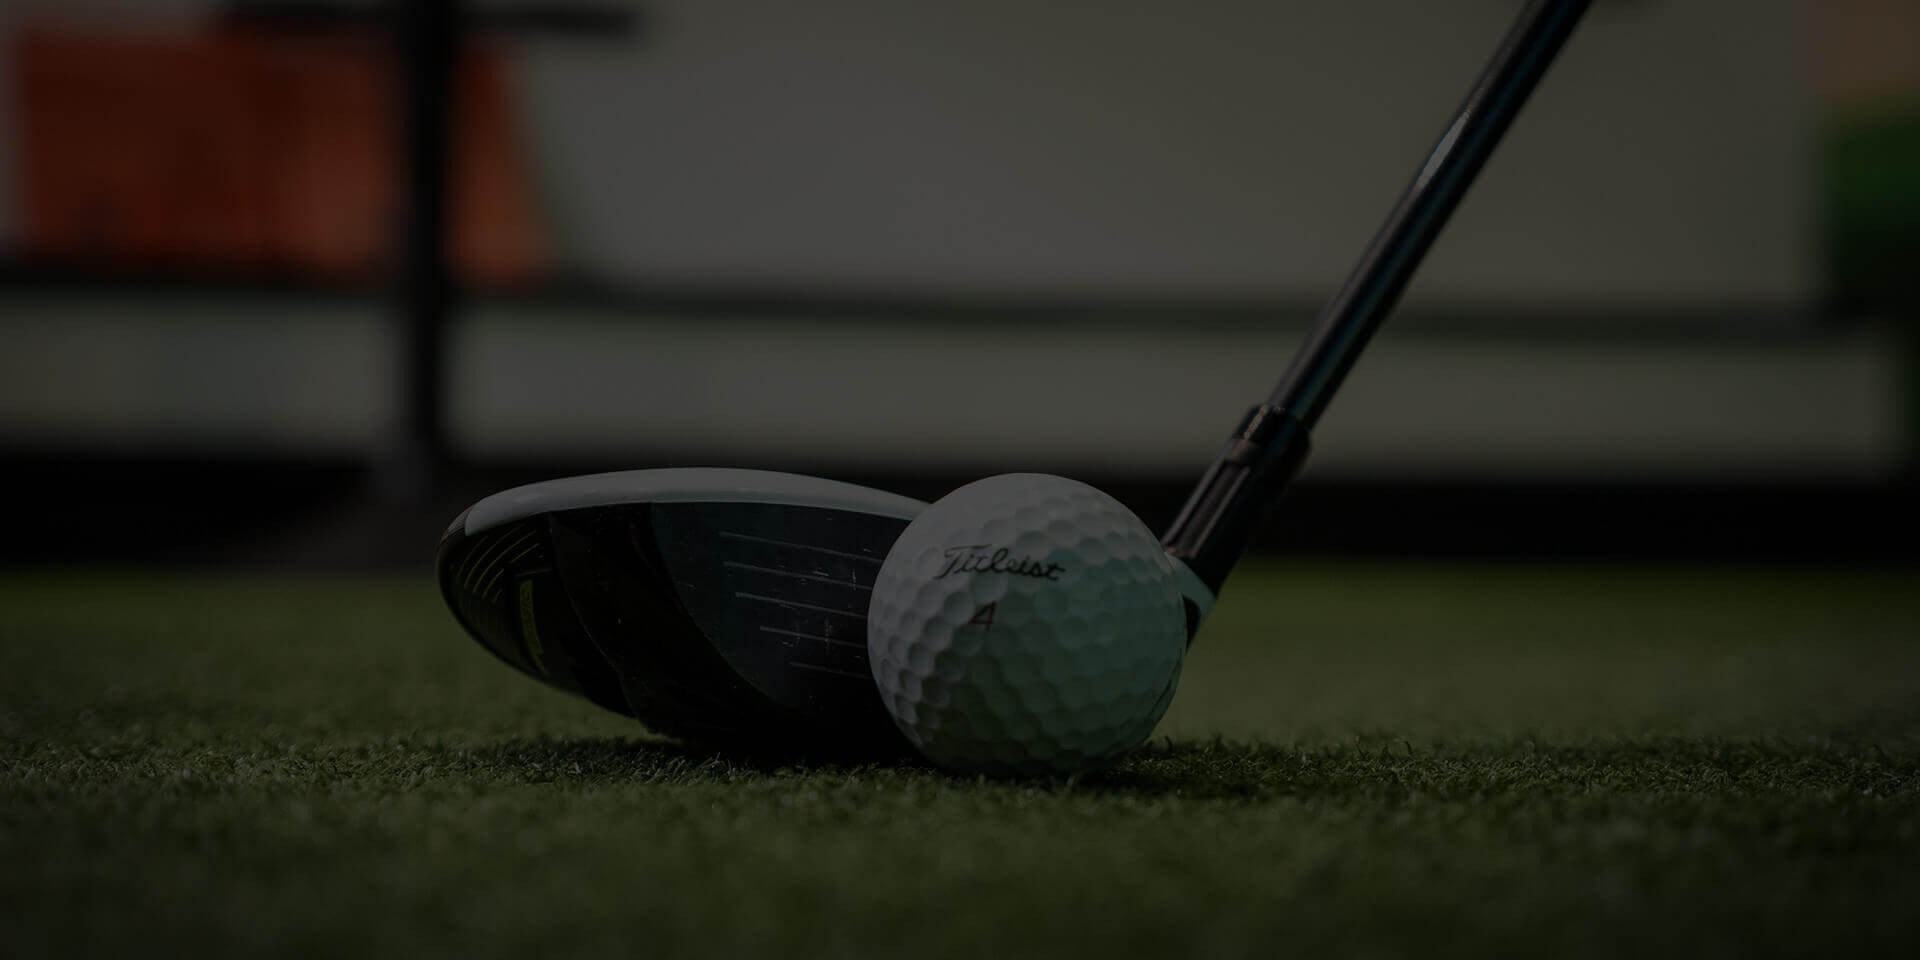 Leigh Golf Studio in Essex